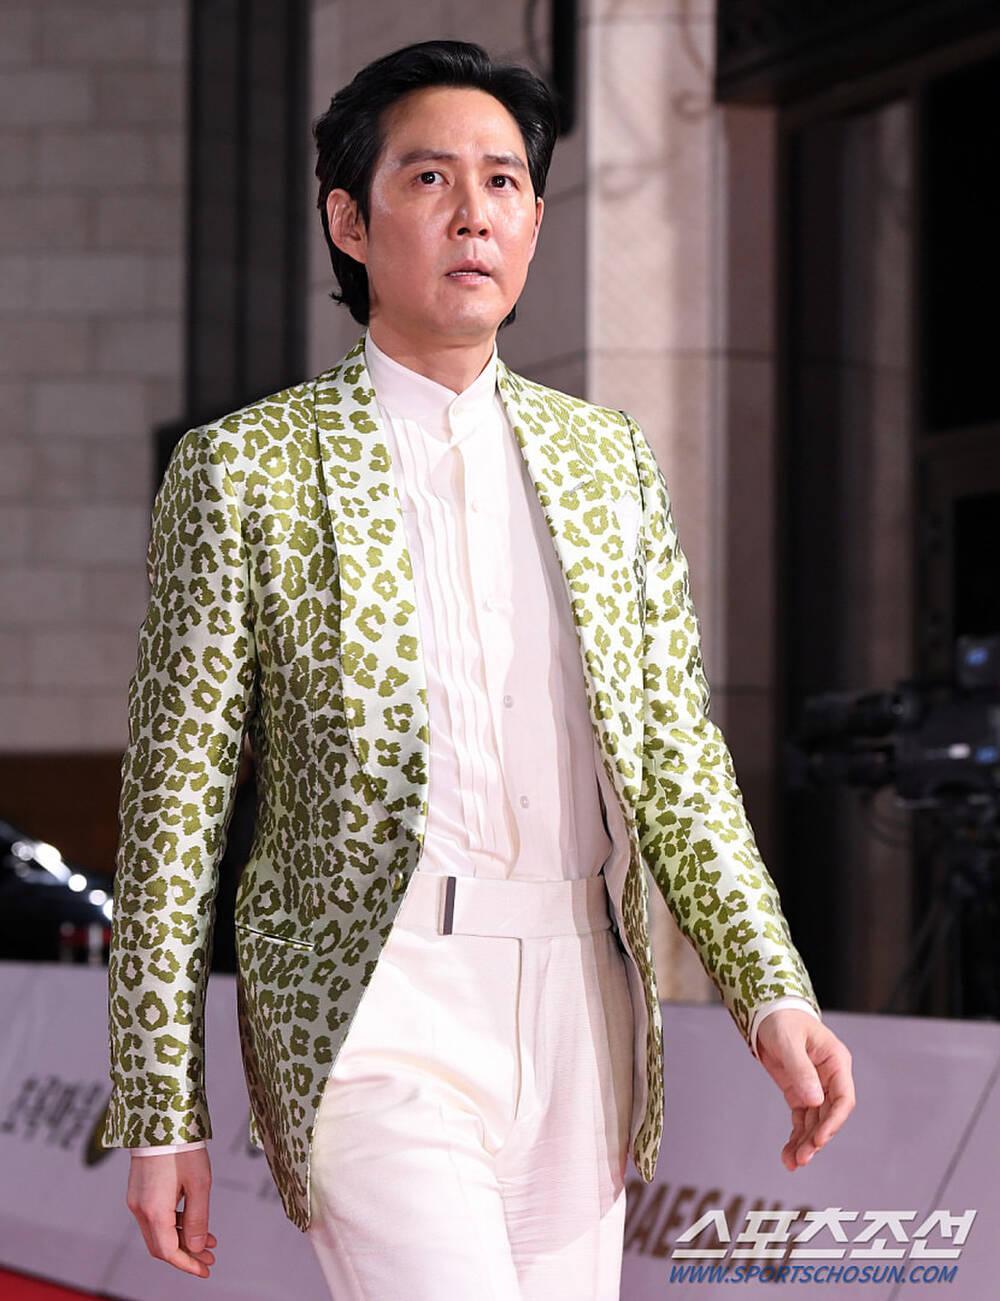 Thảm đỏ 'Rồng xanh 2020': Shin Hye Sun 'cân sắc' Shin Min Ah, Jung Woo Sung - Lee Byung Hun điển trai! Ảnh 25